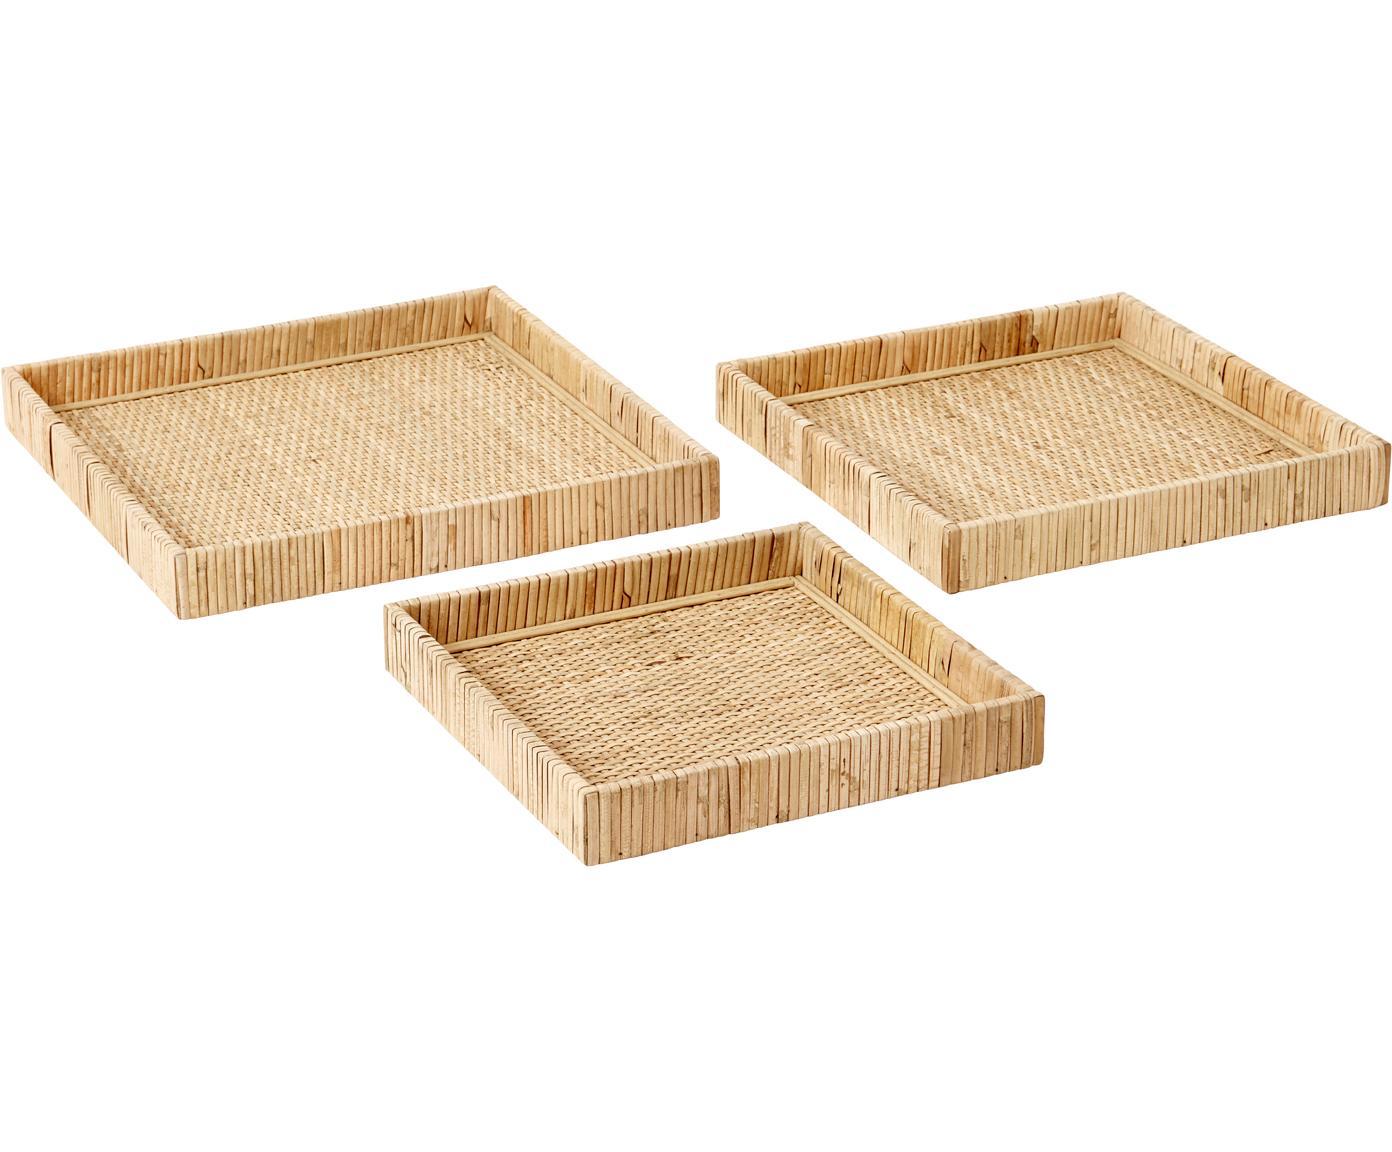 Dienbladenset Fuji, 3-delig, 50% rotan, 50% multiplex, Rotankleurig, Verschillende formaten